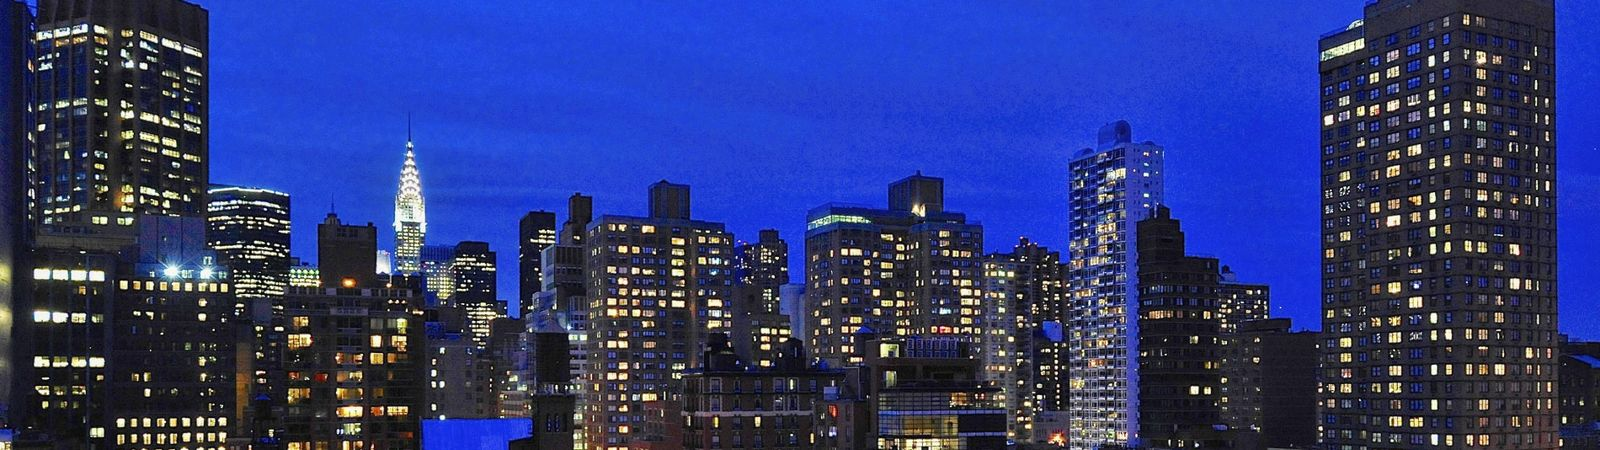 View of New York City Skyline At Night